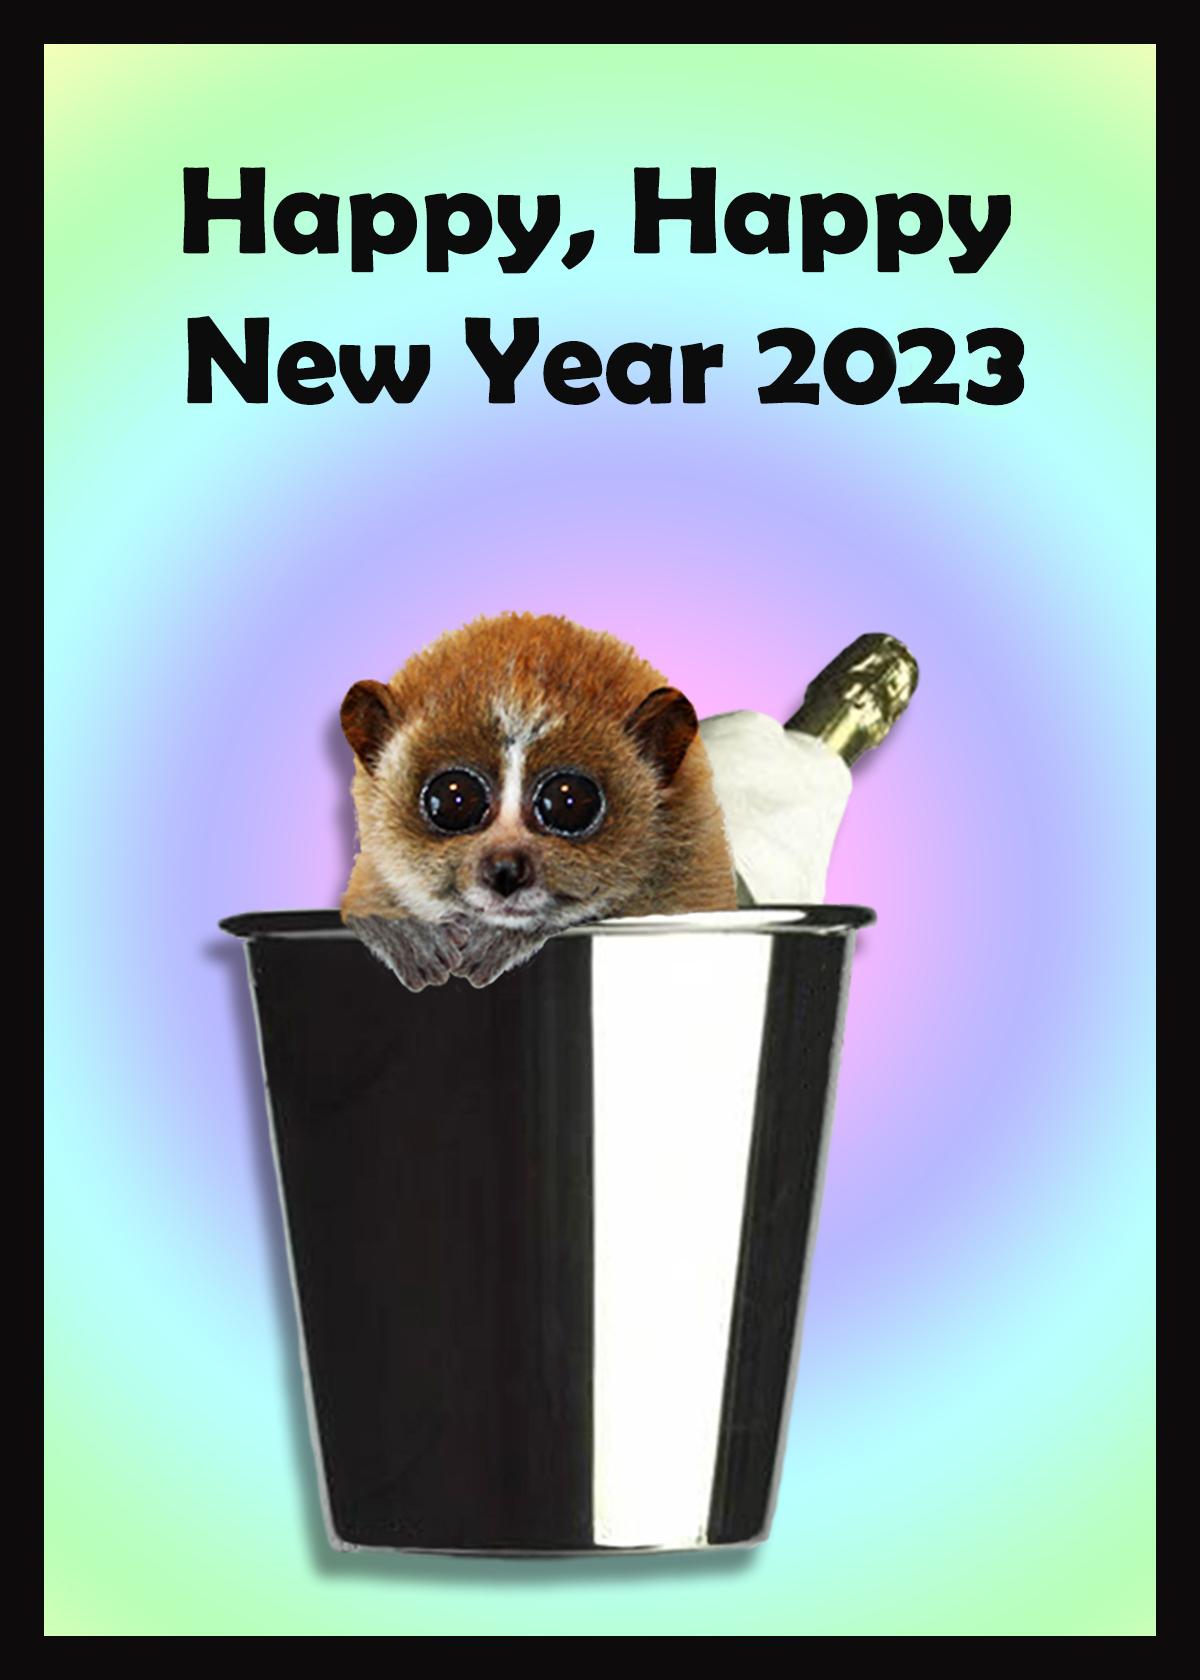 January Calendar Cards January Northern Hemisphere Calendar Education World Send A Happy New Year Card